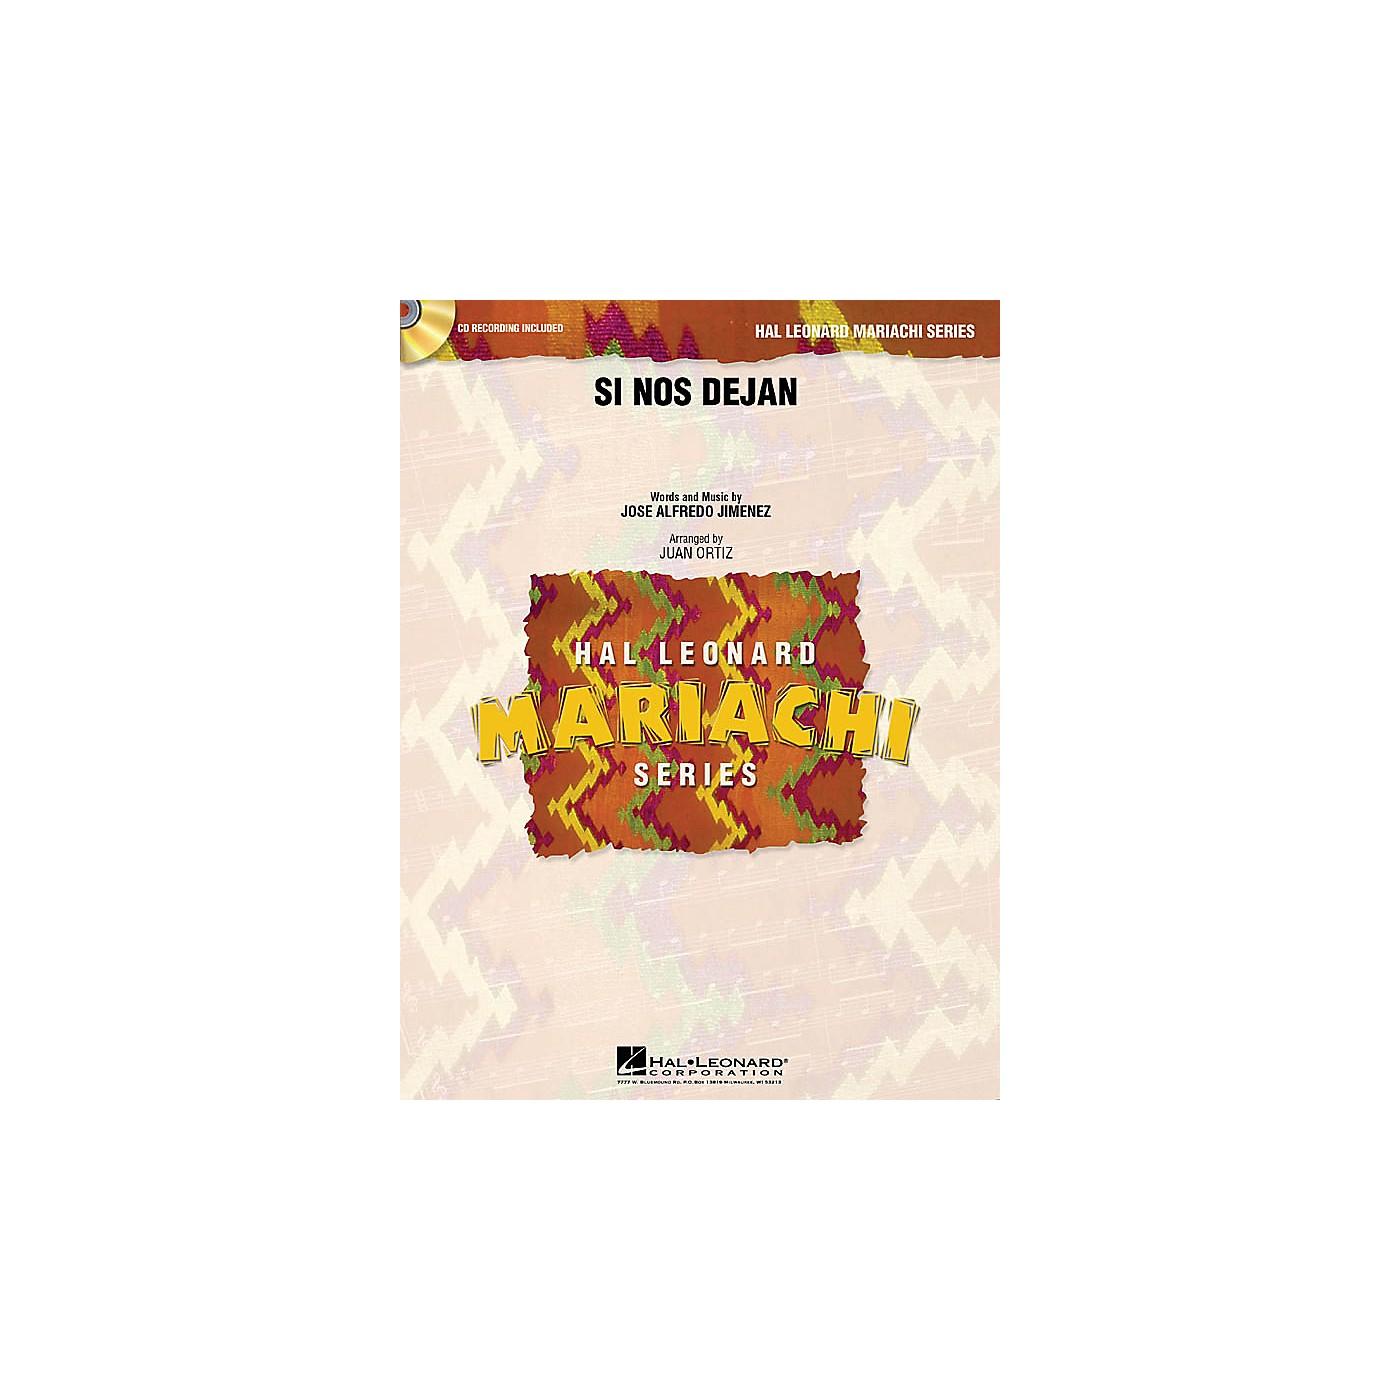 Hal Leonard Si Nos Dejan Concert Band Level 3 Arranged by Juan Ortiz thumbnail